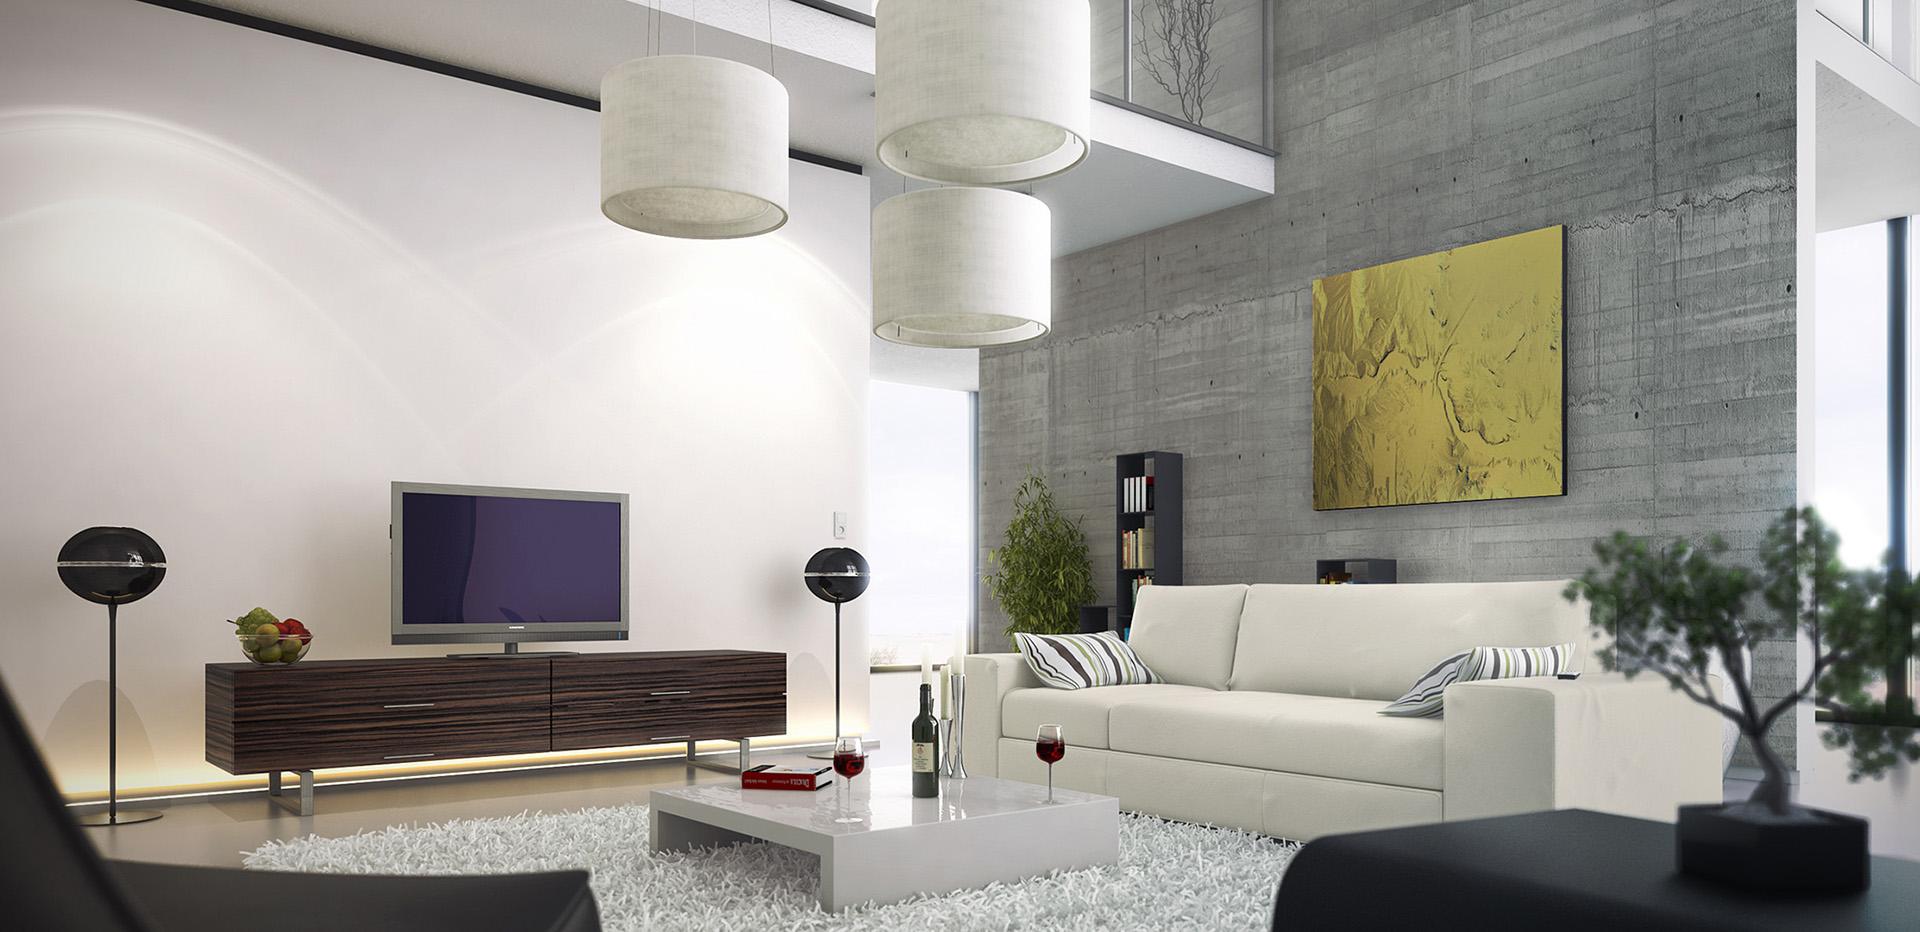 TV Spot - virtual set